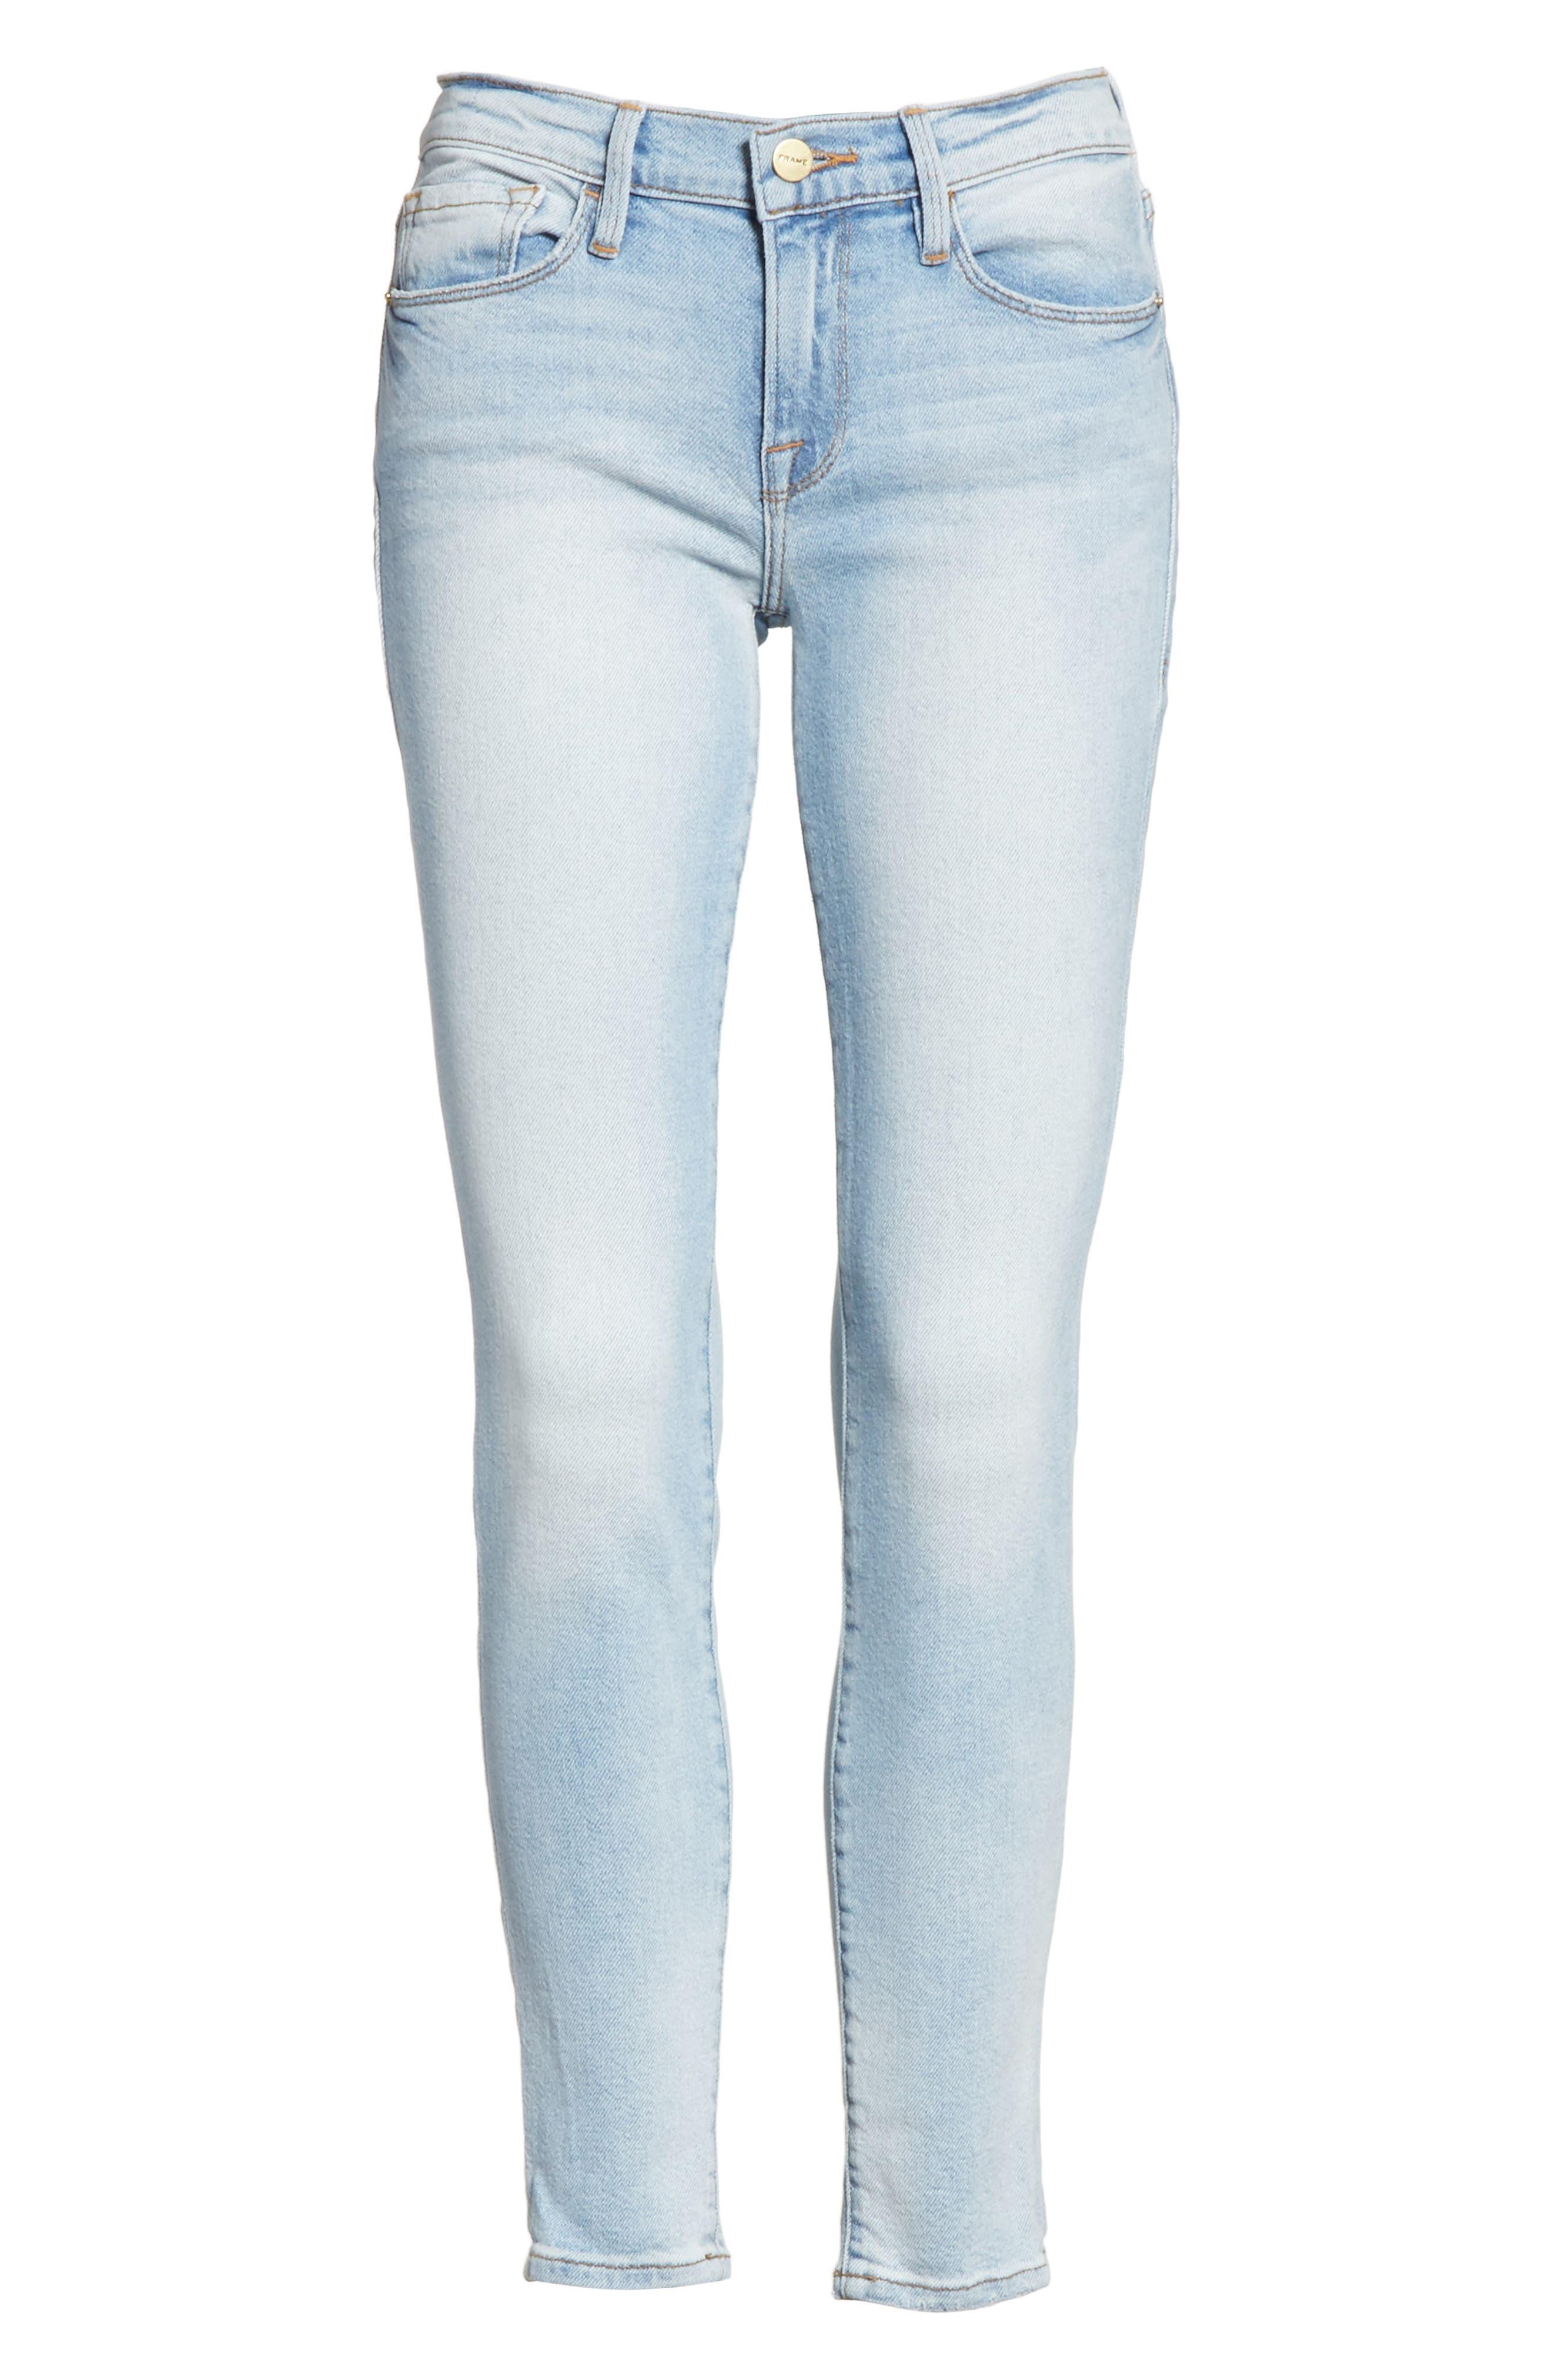 Le Skinny de Jeanne Ankle Jeans,                             Alternate thumbnail 6, color,                             Adeline